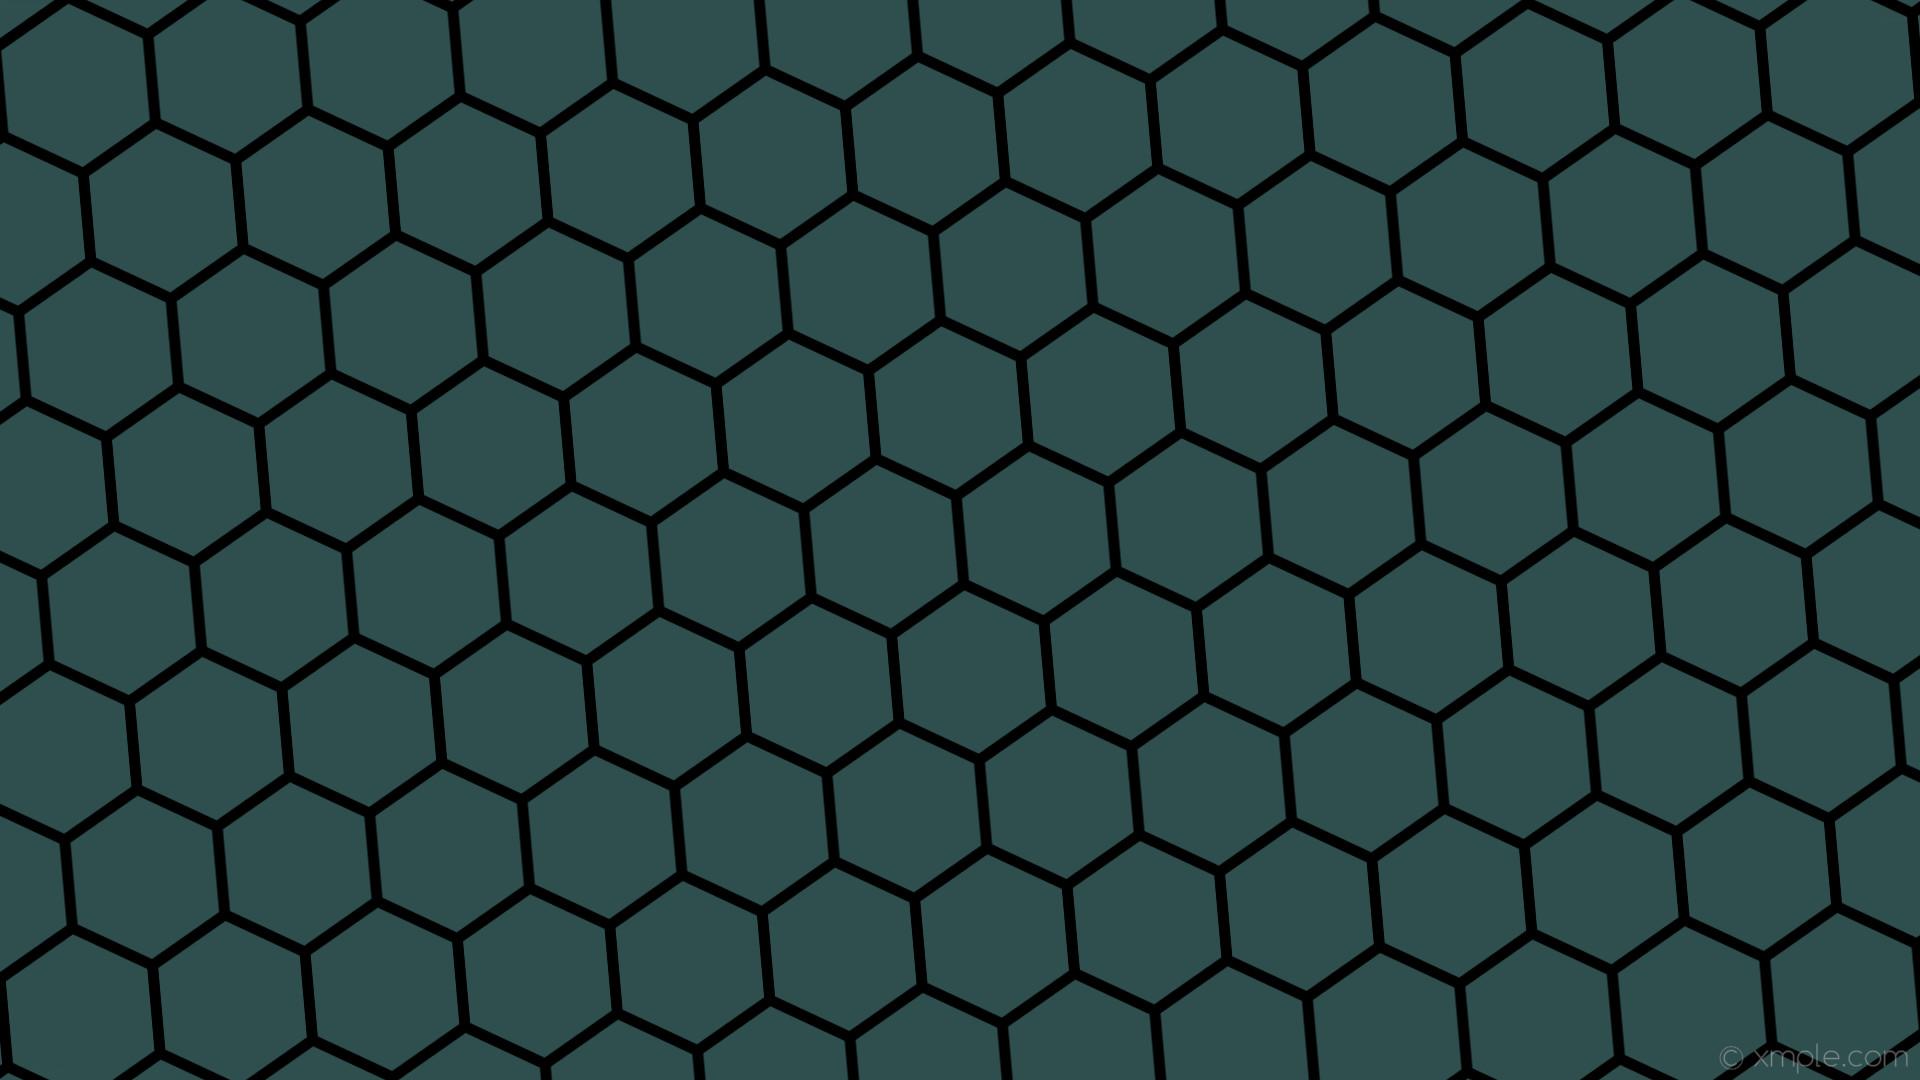 wallpaper honeycomb grey black hexagon beehive dark slate gray #2f4f4f  #000000 diagonal 5°